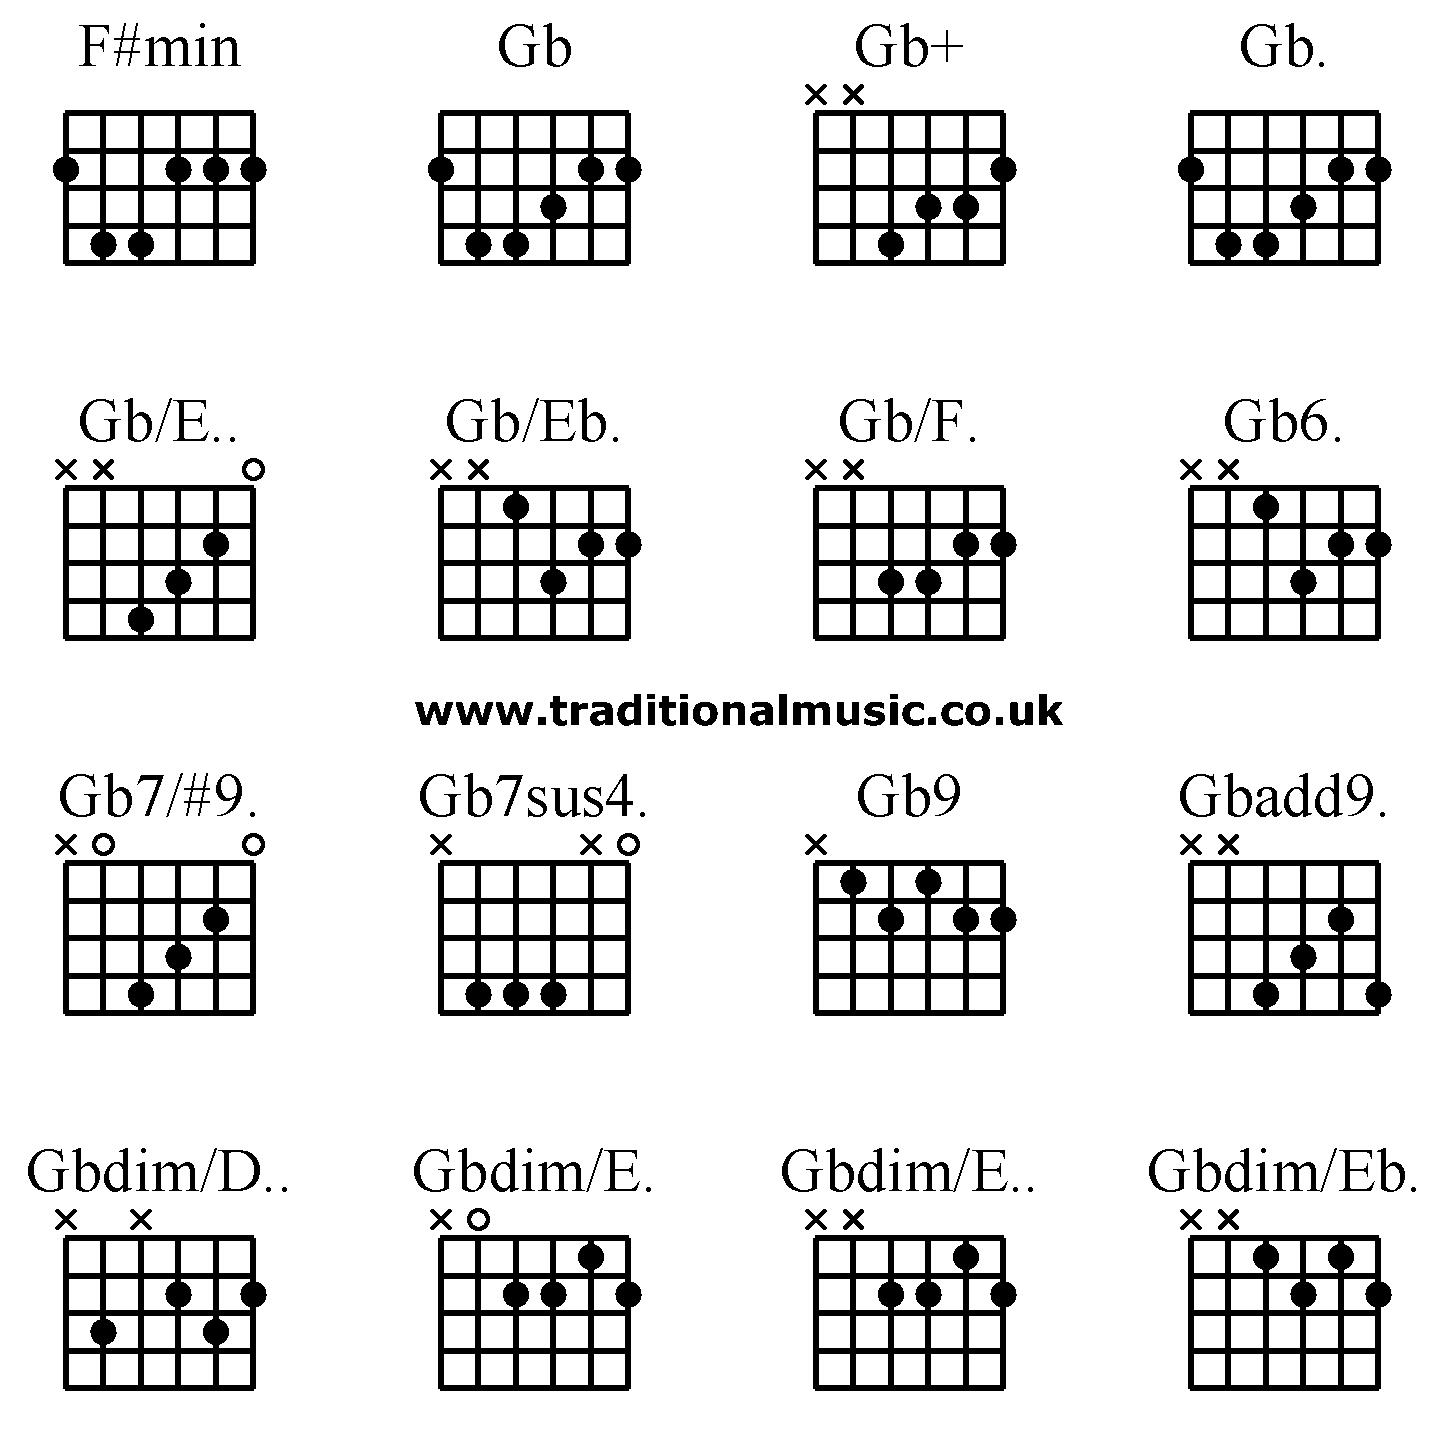 Guitar Chords Advanced F Min Gb Gb Gb Gb E Gb Eb Gb F